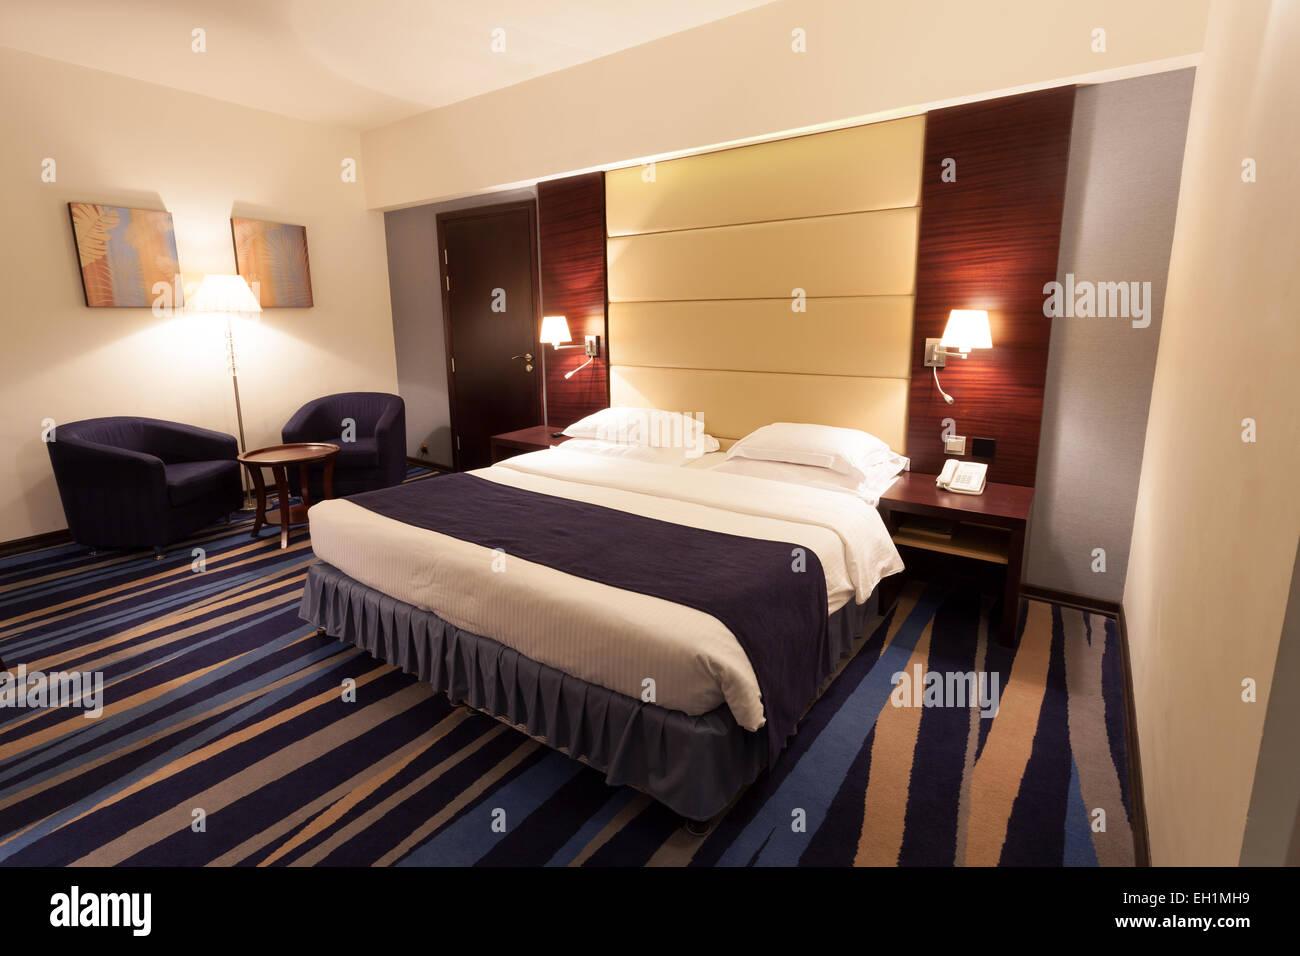 Moderne Zimmer mit Kingsize-Bett Stockfoto, Bild: 79328741 - Alamy